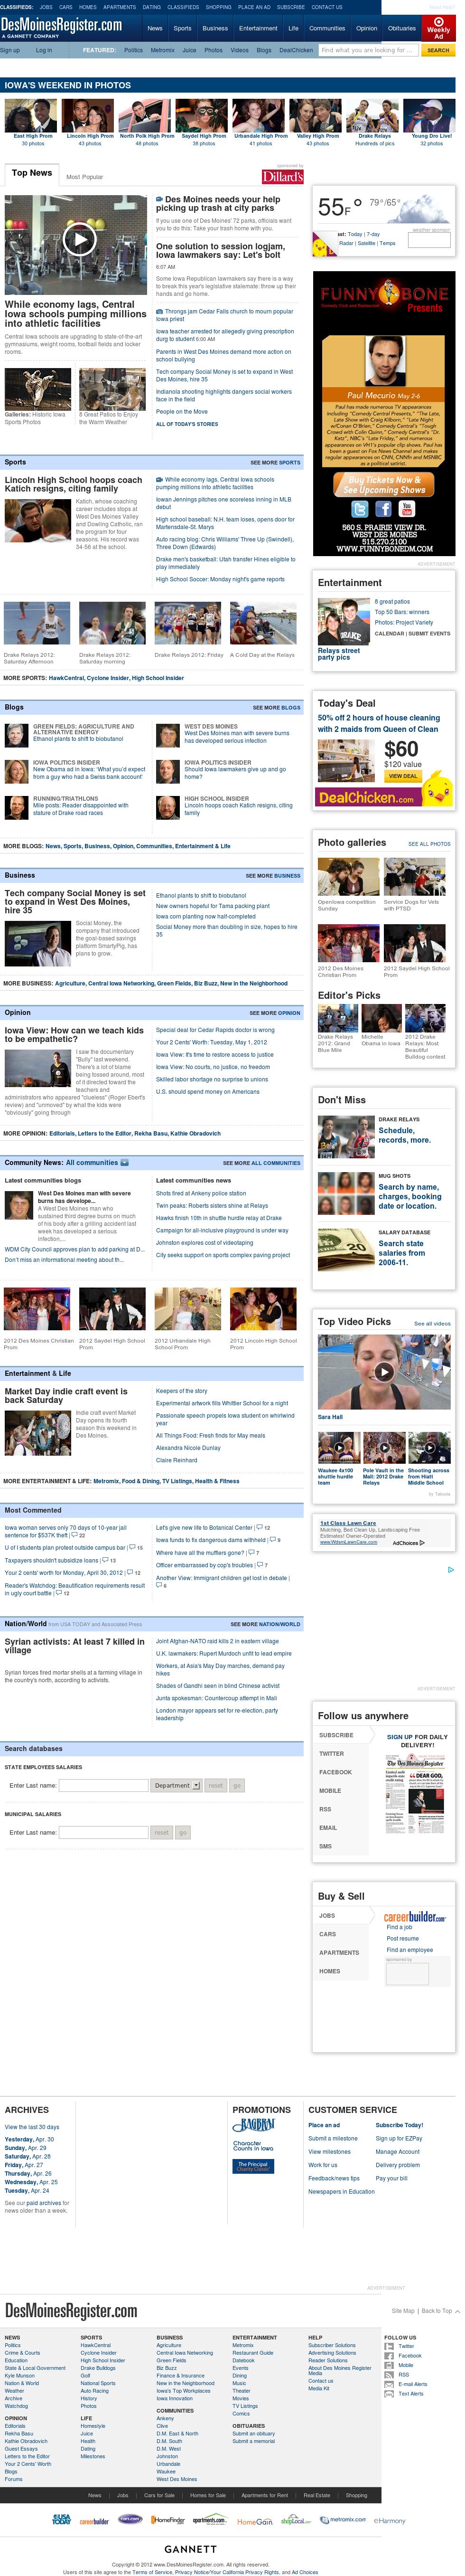 DesMoinesRegister.com at Tuesday May 1, 2012, 12:08 p.m. UTC